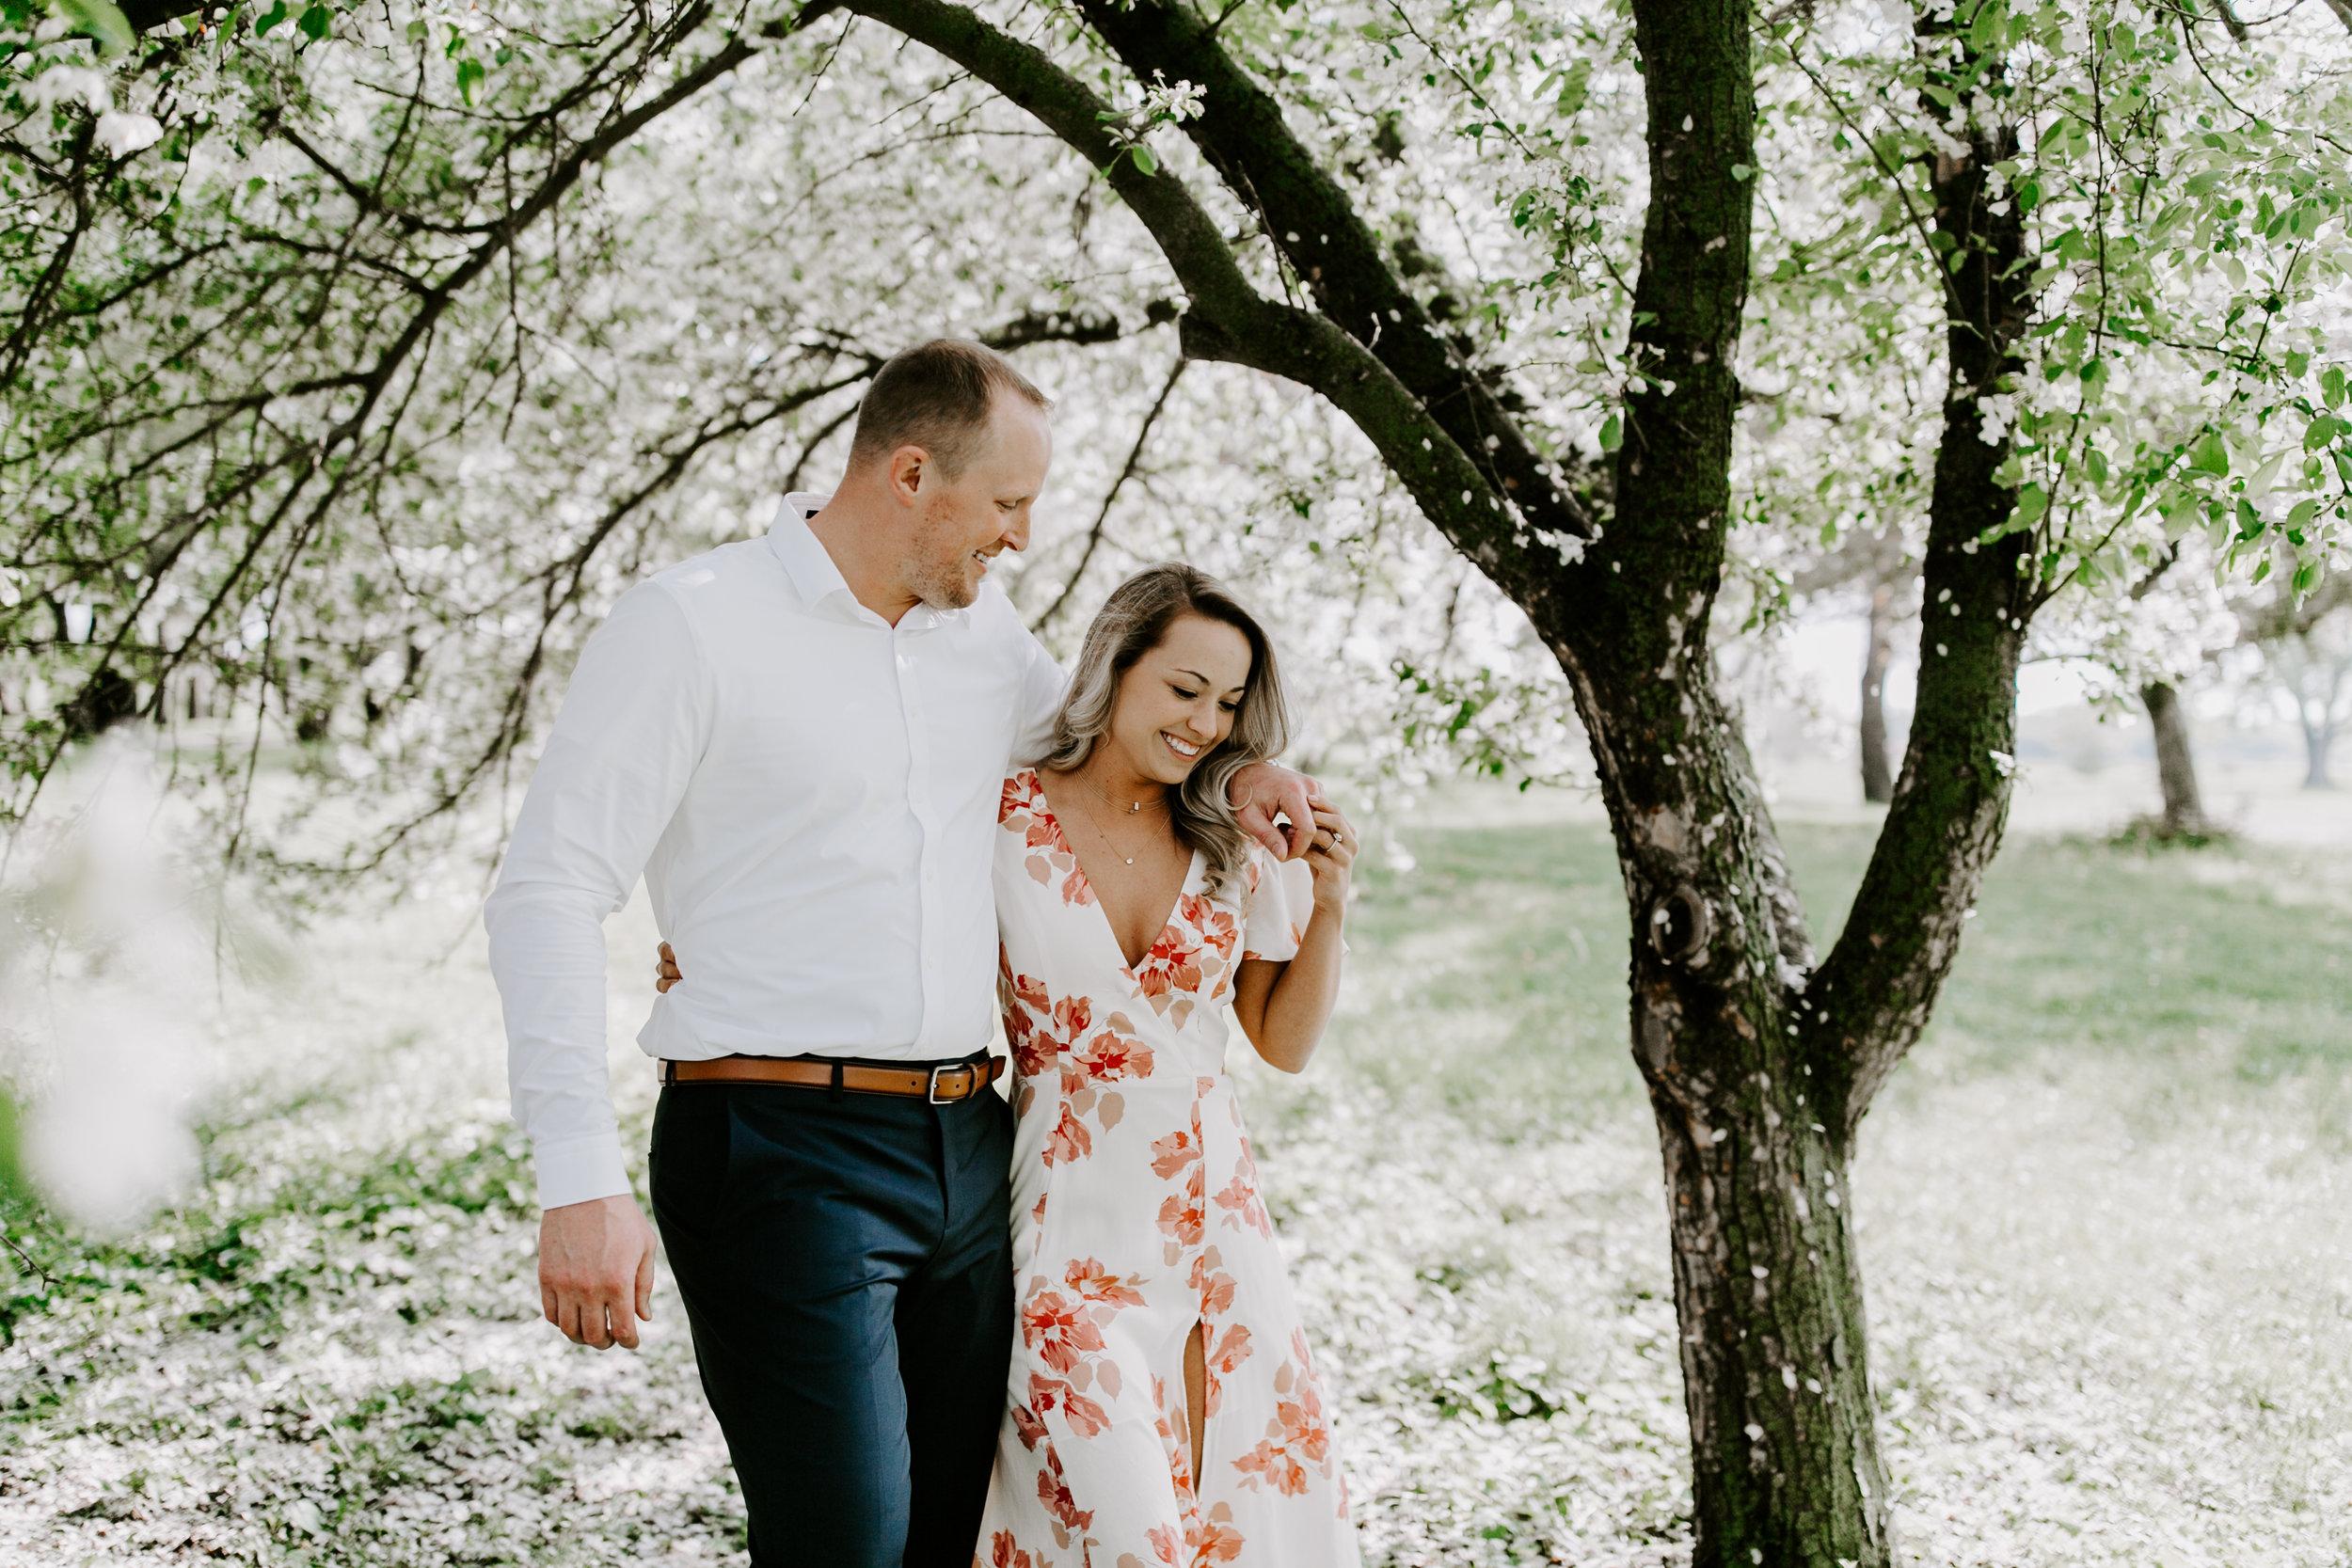 gracetphotography-wedding-photographer-adventure-bride-engagement-midwest-10.jpg